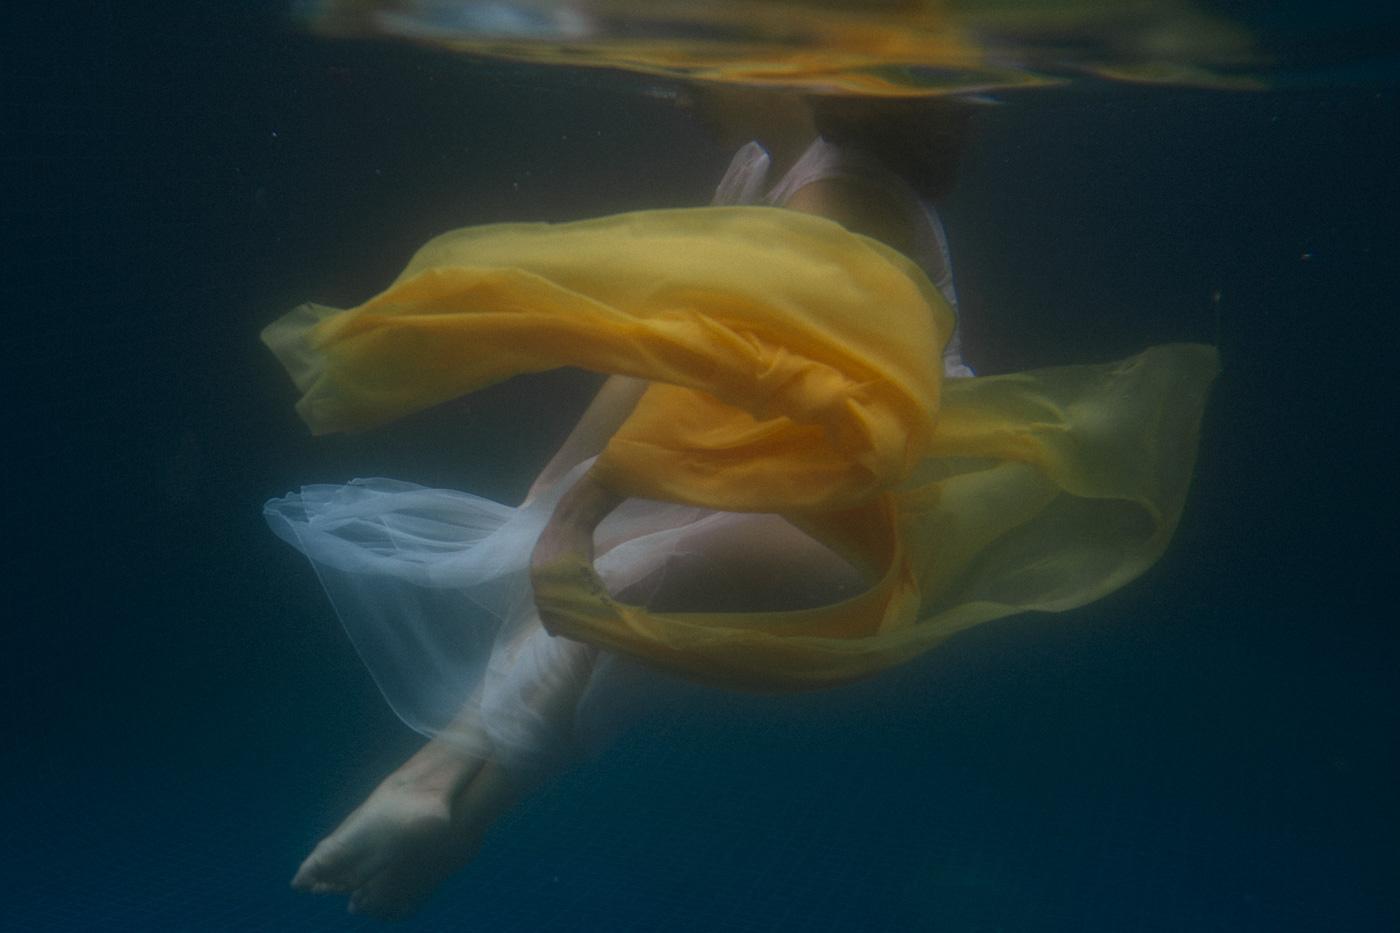 Rebekah_Kamsky_Photography_Sian_Corrigan_Warmer_Colours_(6_of_7).jpg